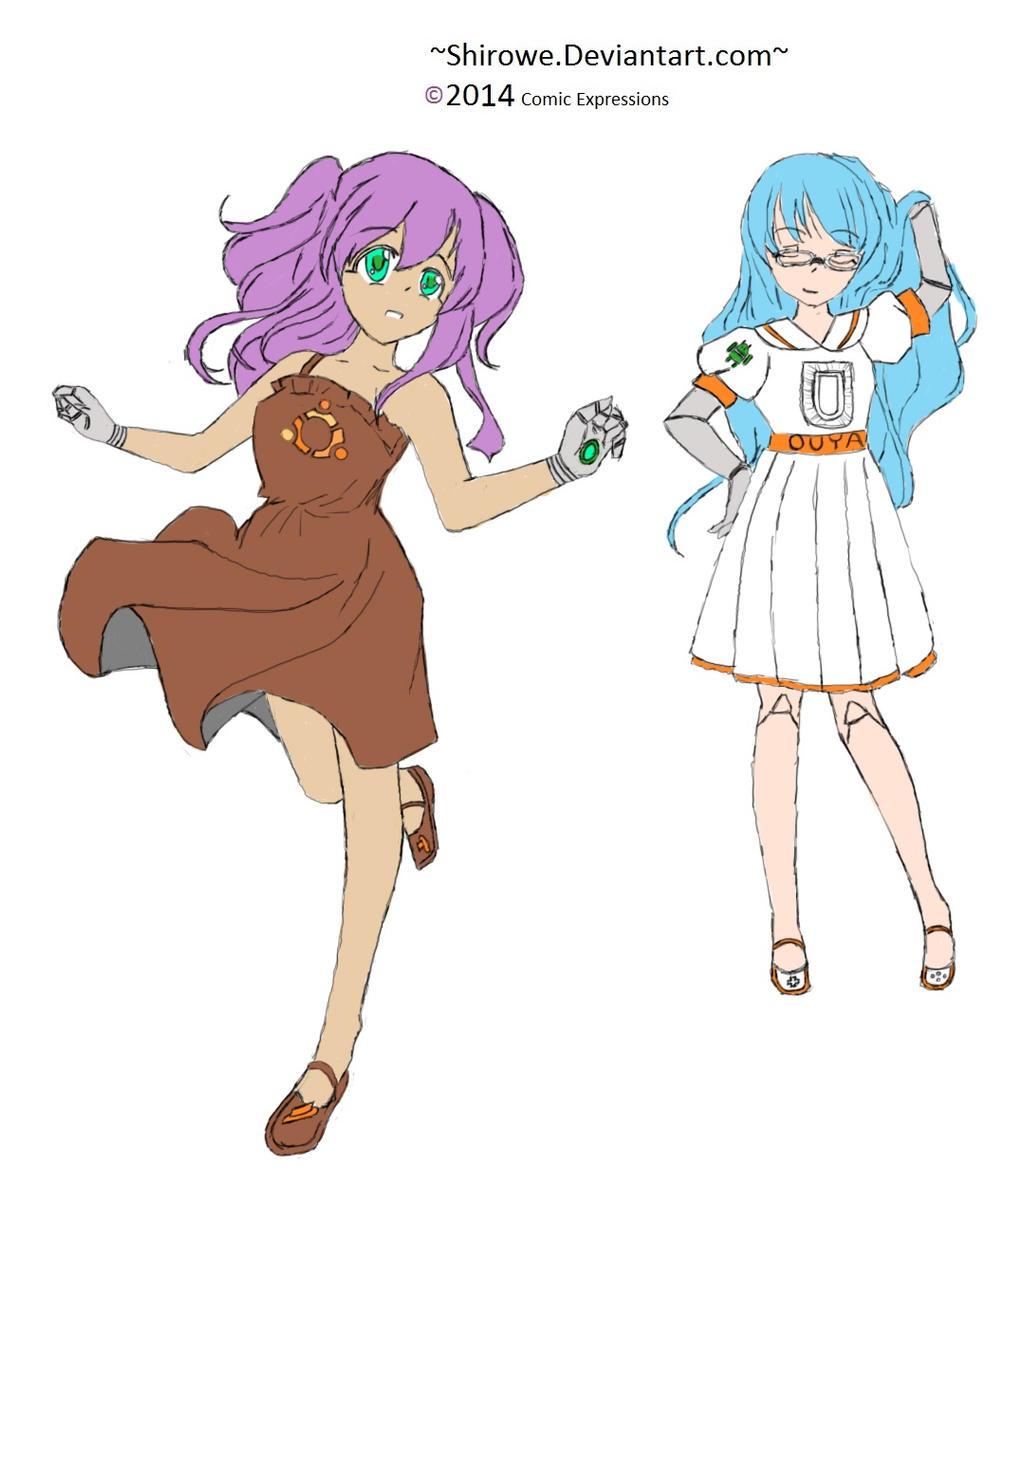 Ubuntu and Ouya (full color) by Shirowe